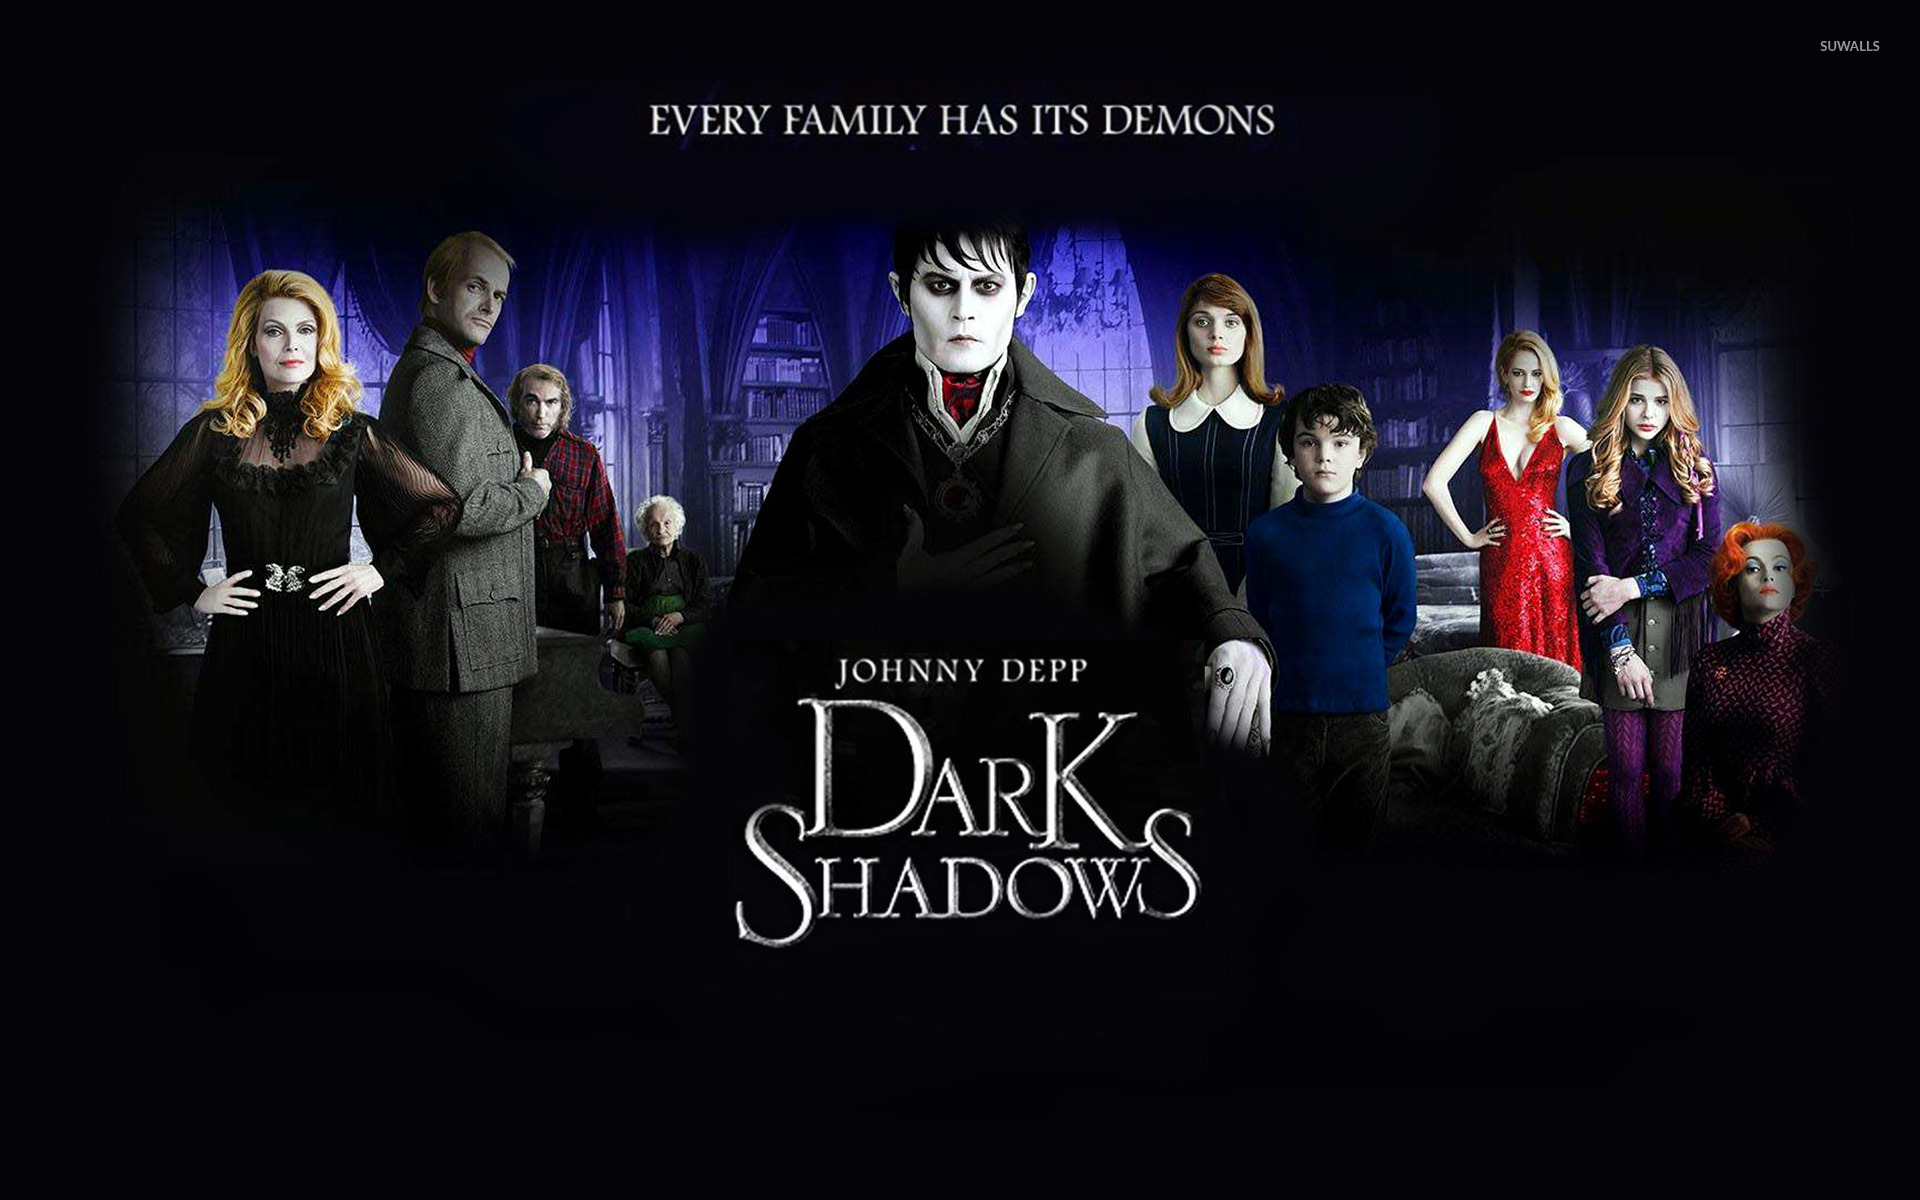 Dark shadows wallpaper movie wallpapers 12934 dark shadows wallpaper publicscrutiny Image collections